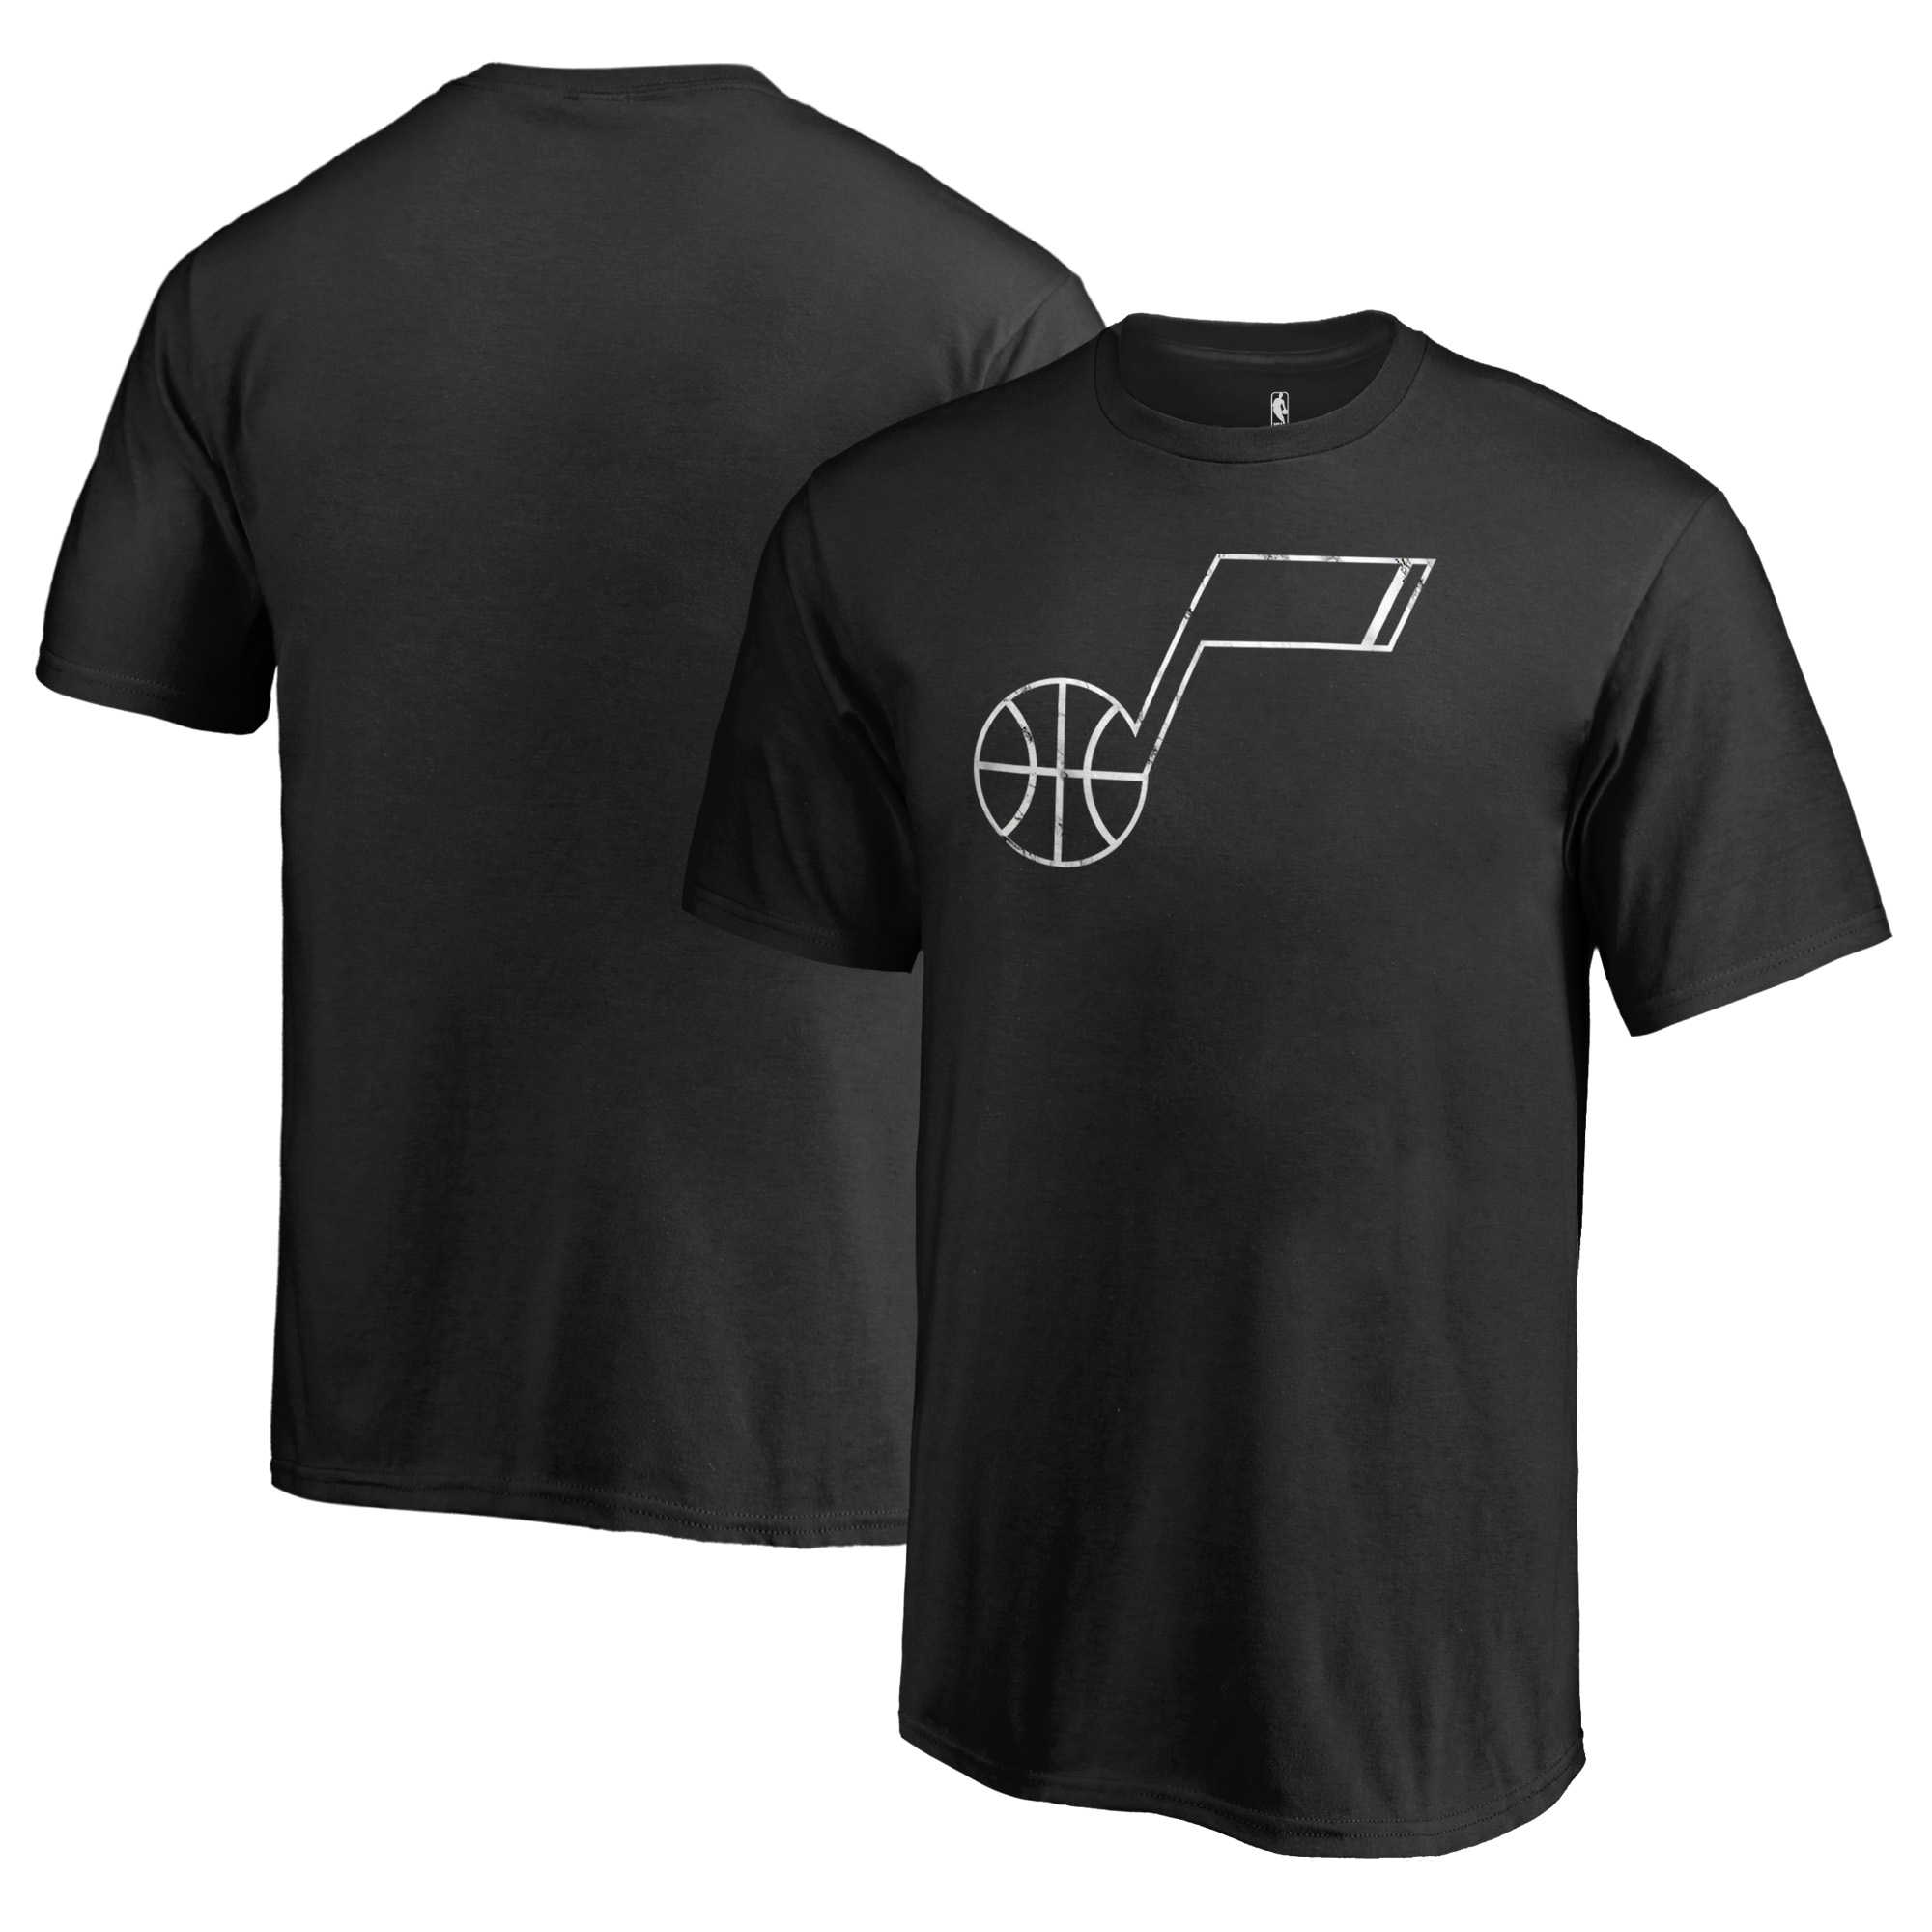 Utah Jazz Fanatics Branded Youth Marble Logo T-Shirt - Black